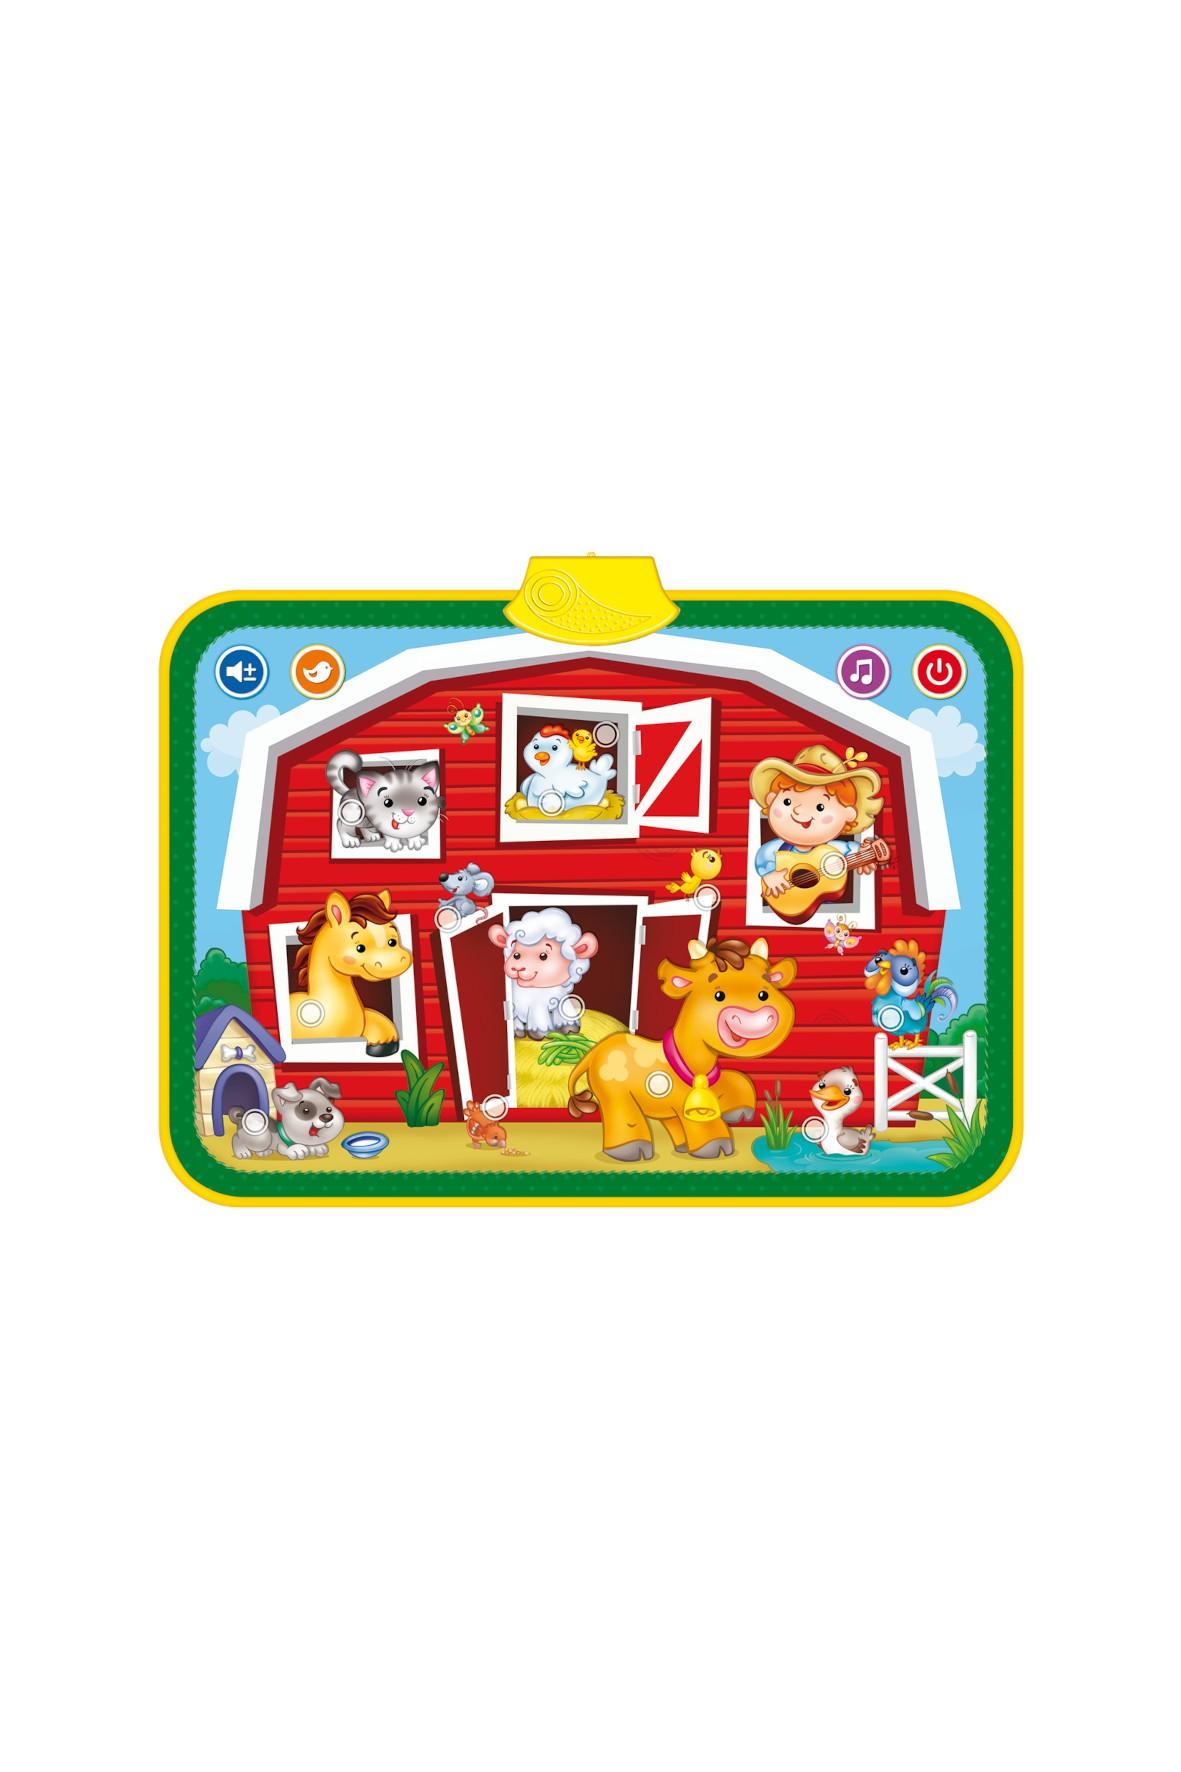 Mata Wiejska Chatka- zabawka edukacyjna wiek 12msc+